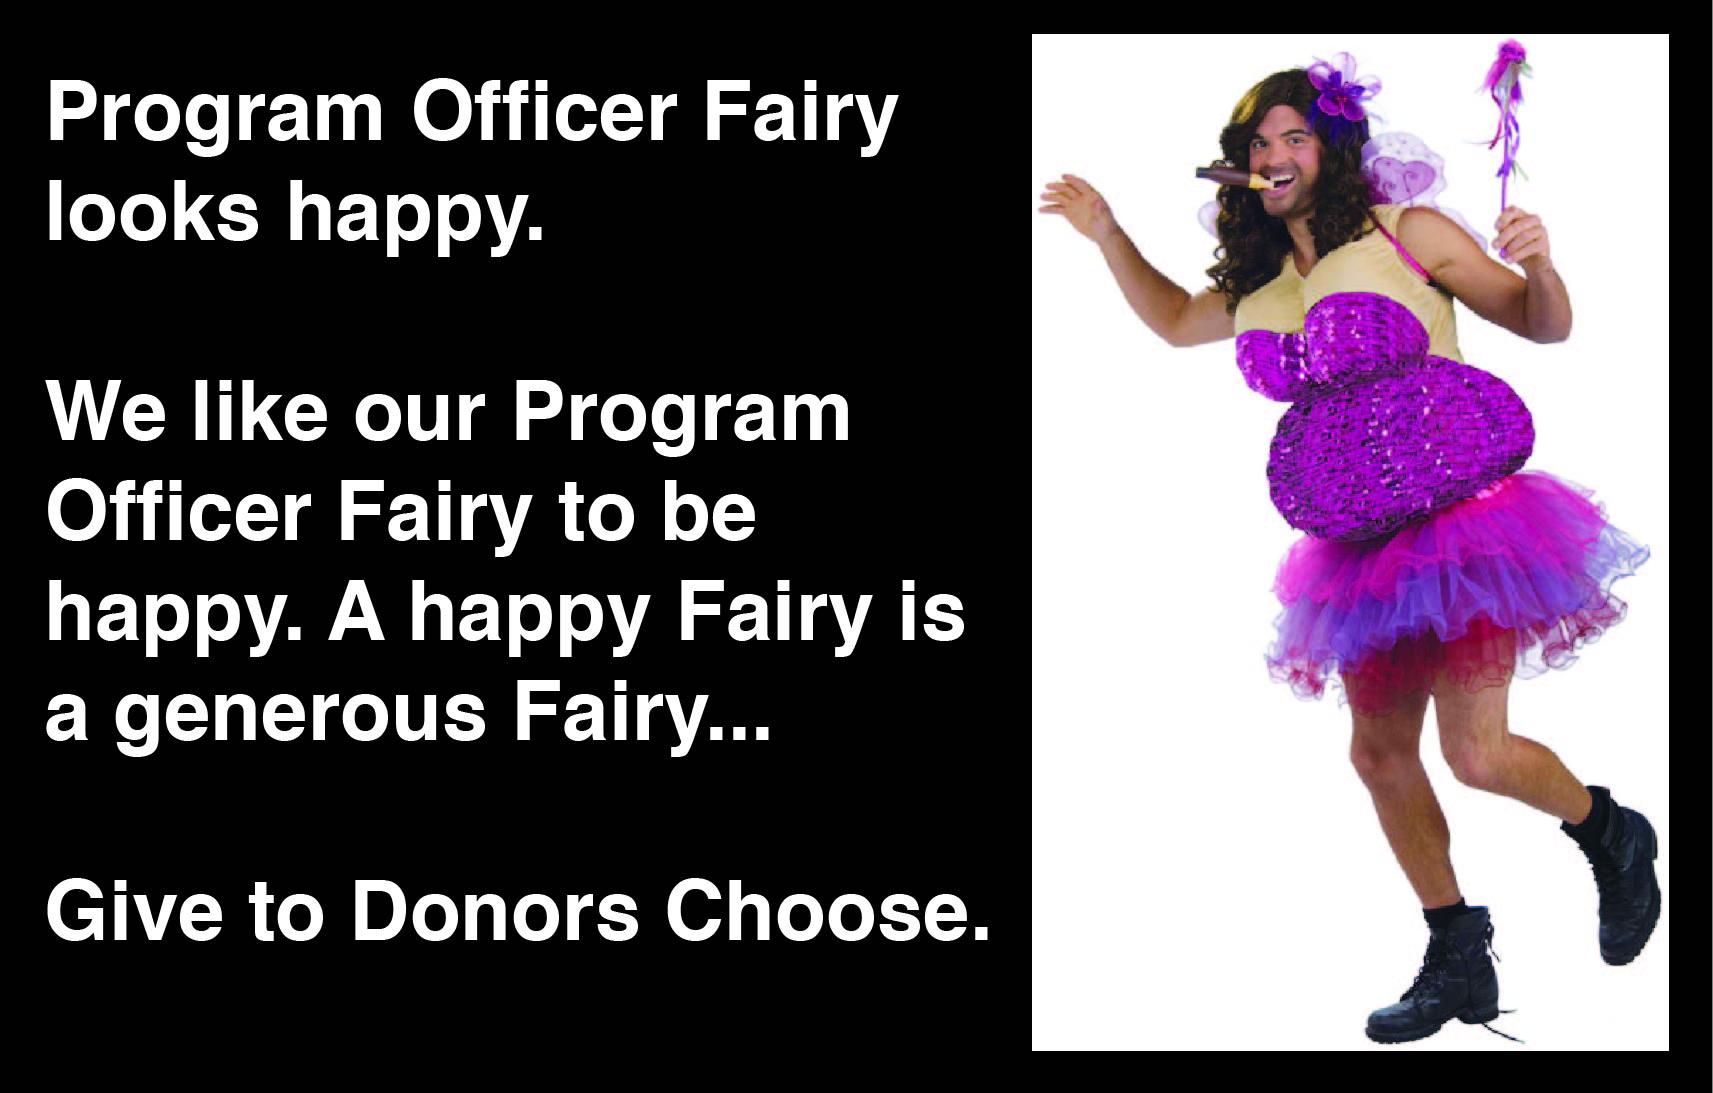 PO Fairy